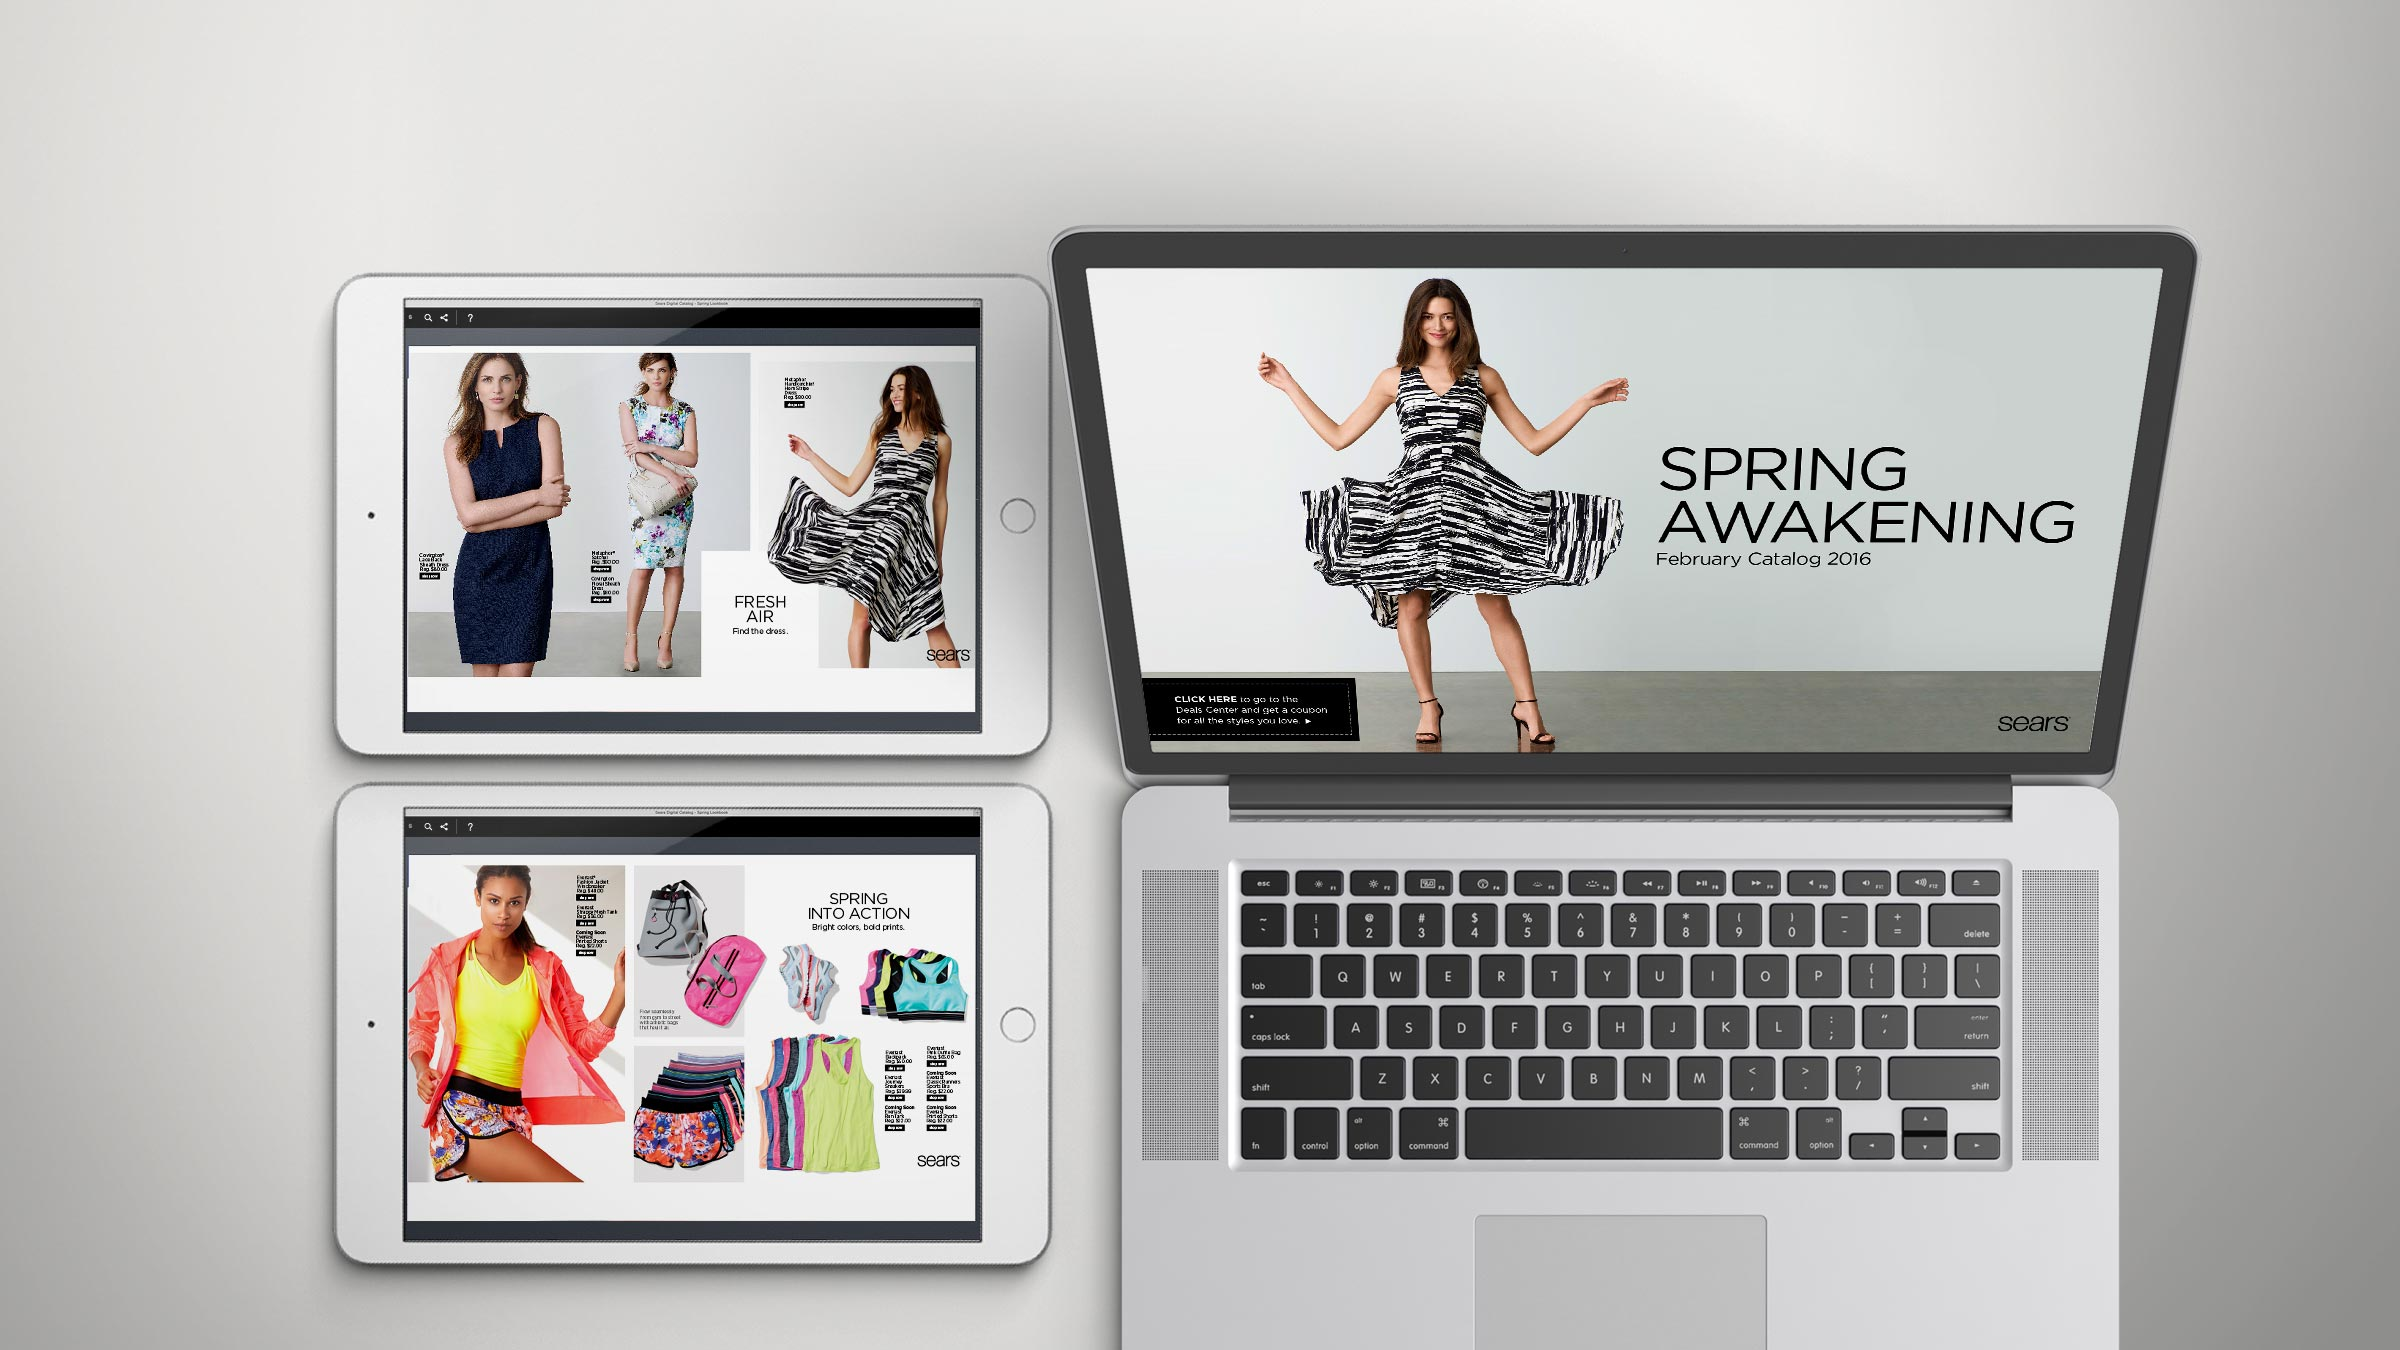 Sears_Digital_Lookbook.jpg